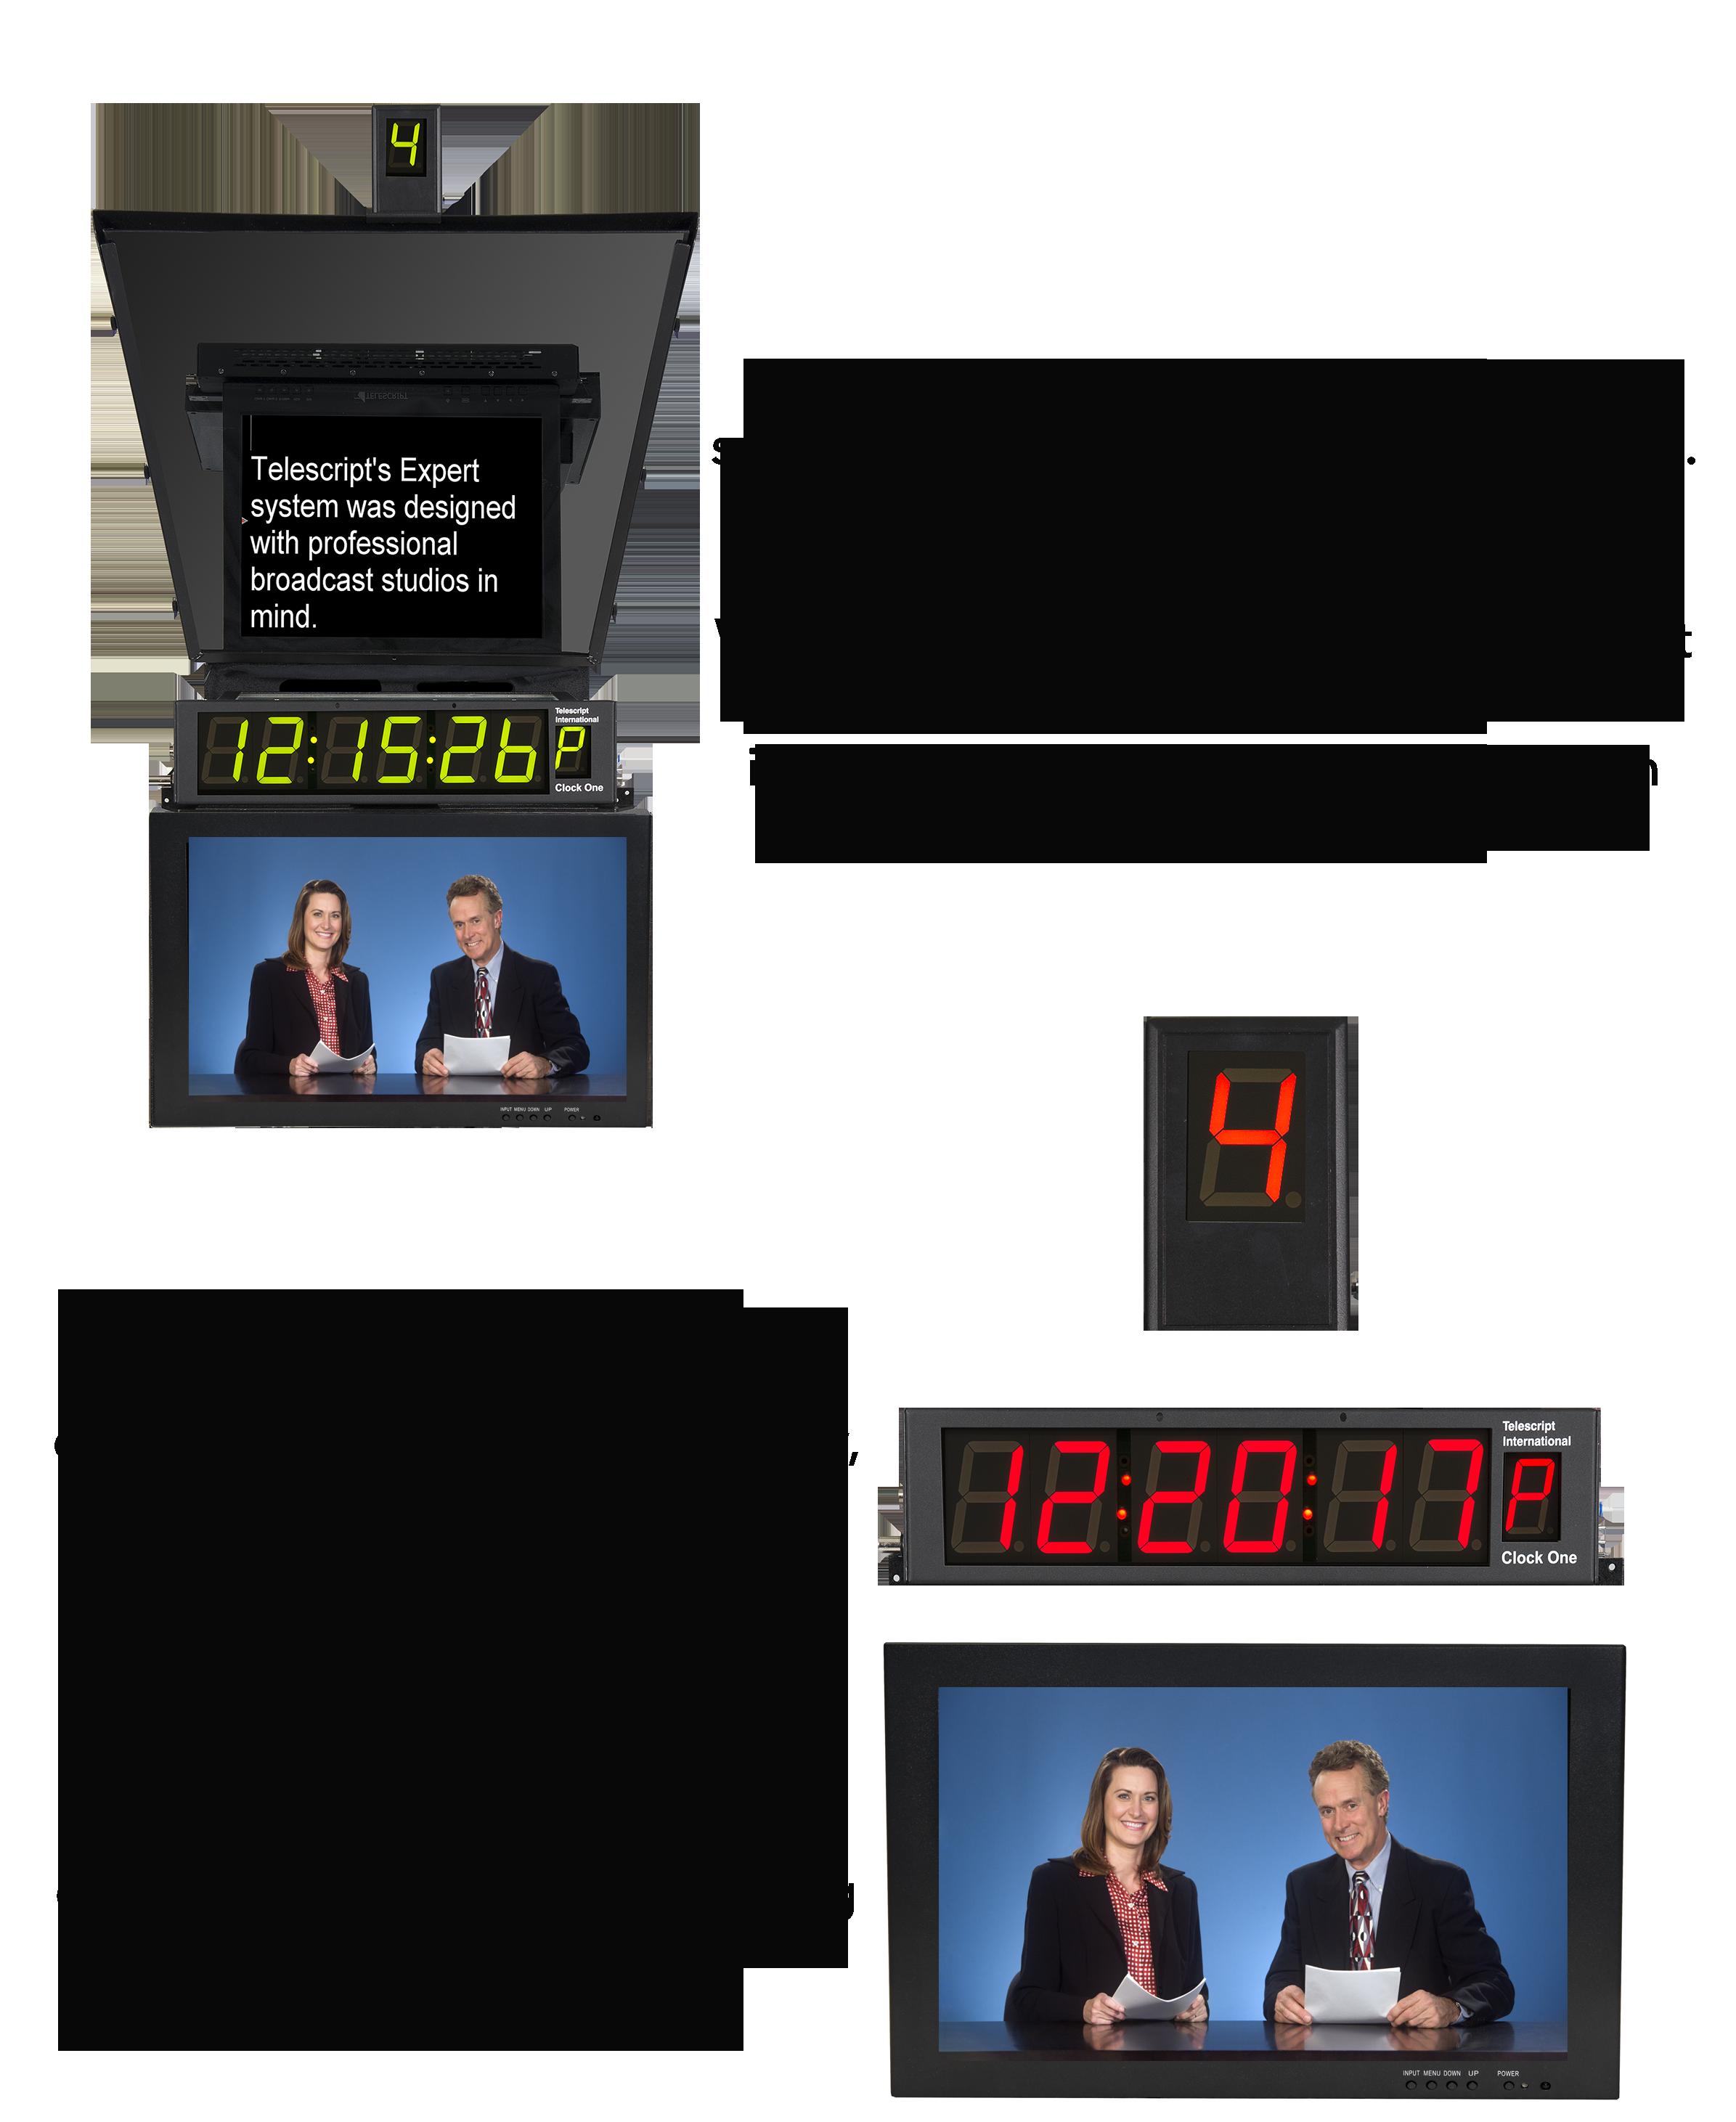 Telescript Studio Teleprompter System - Expert   Telescript